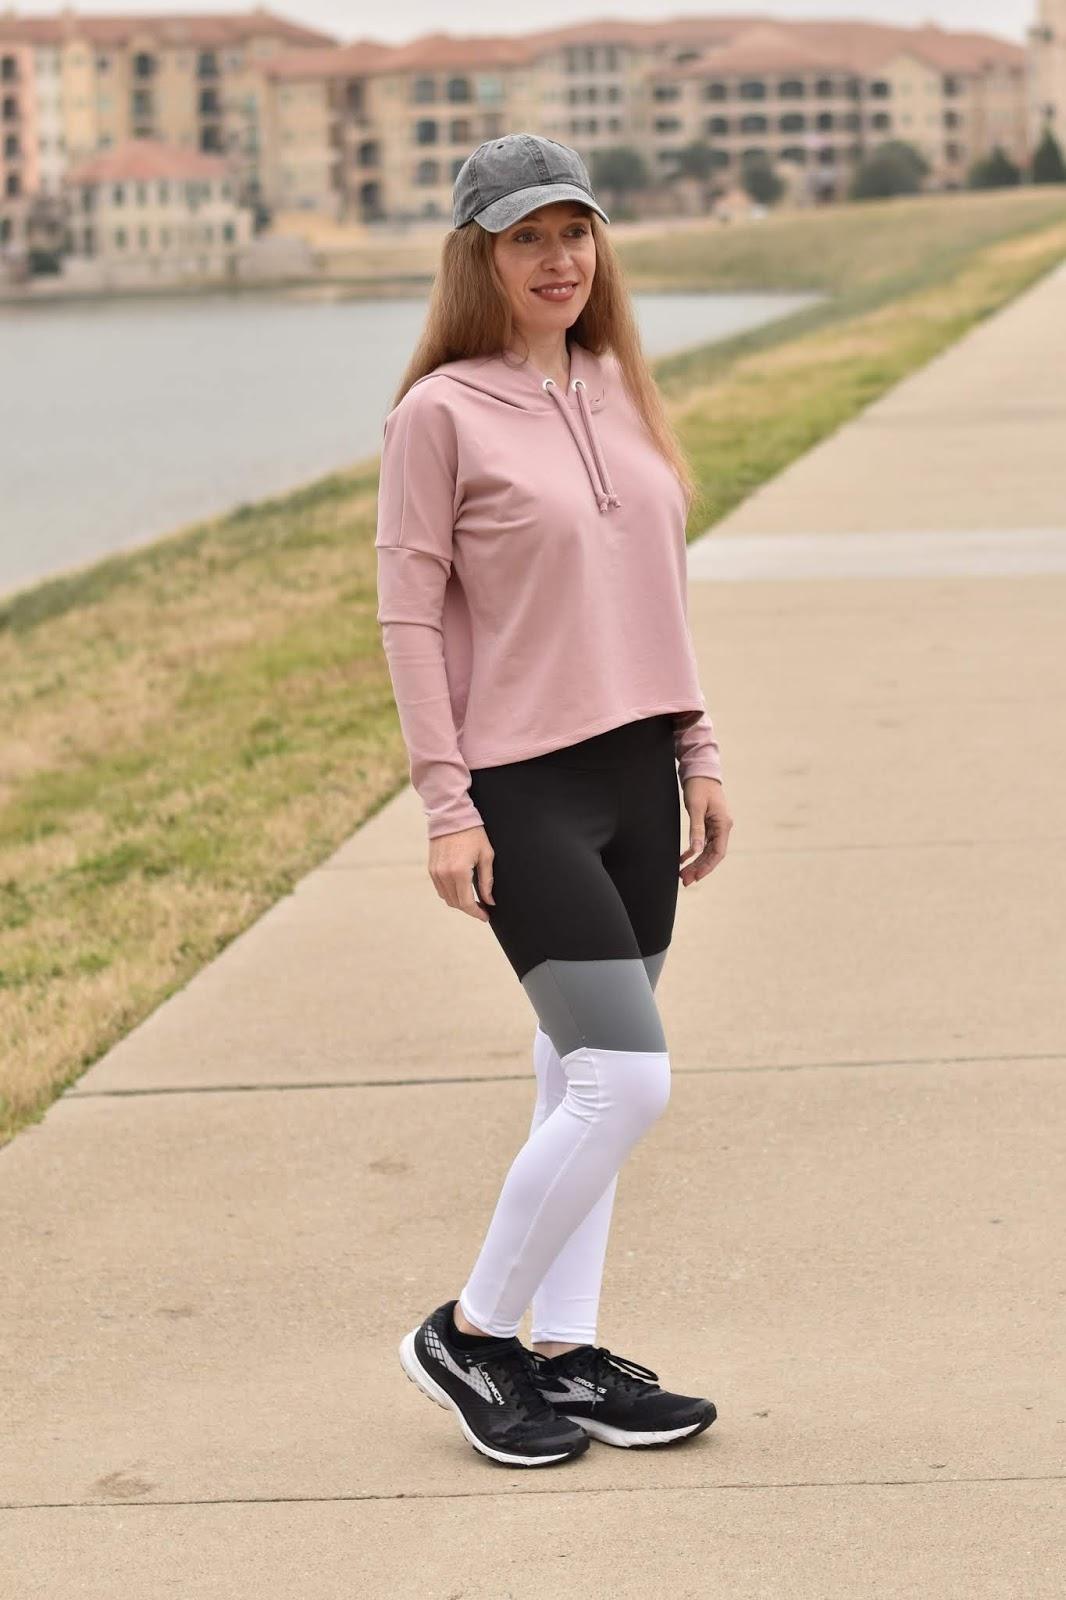 Sewing Colorblocked Athletic Leggings